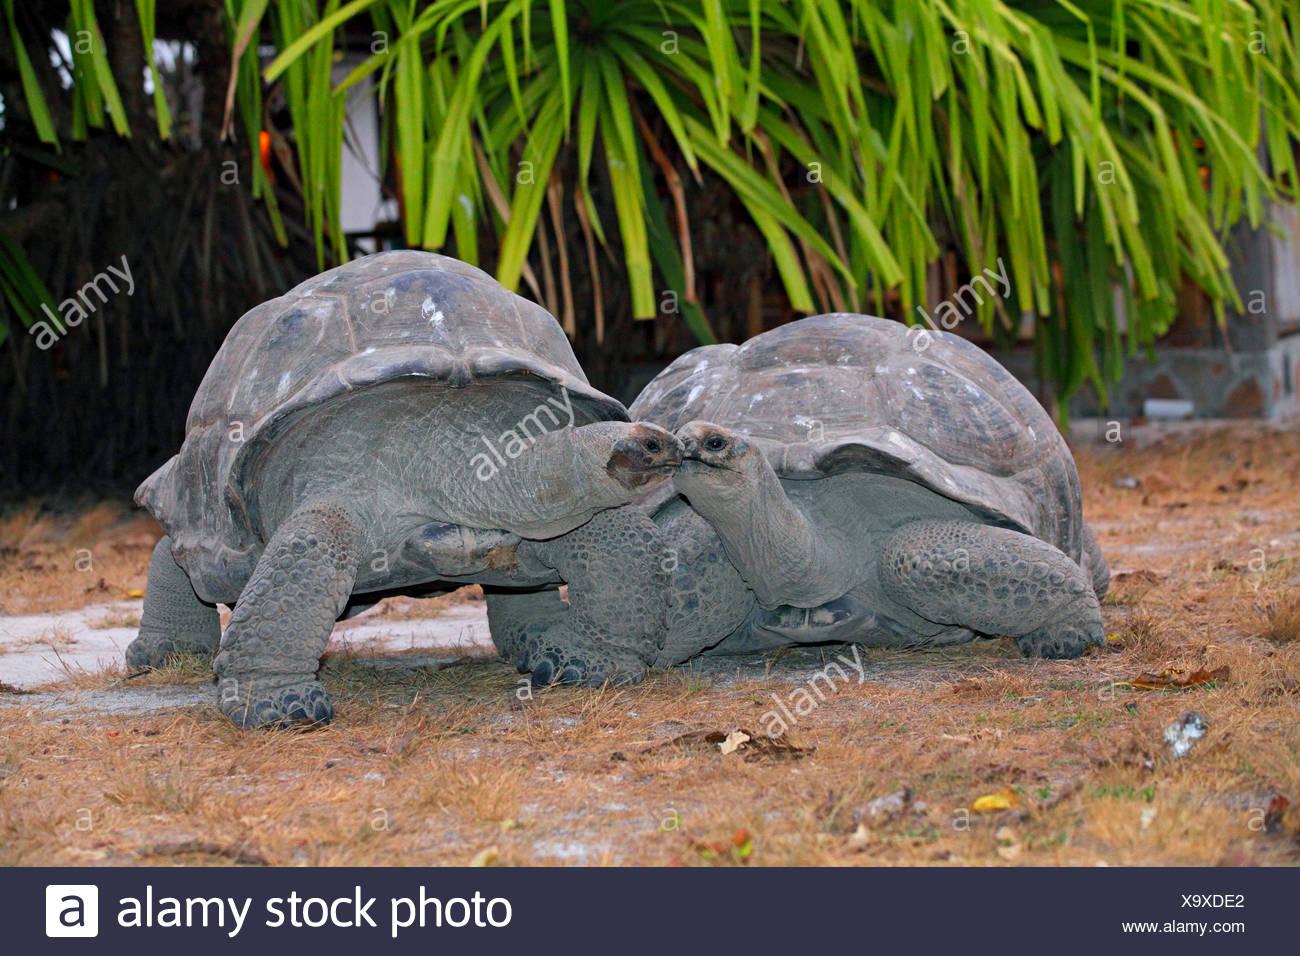 Seychelles giant tortoise, Aldabran giant tortoise, Aldabra giant tortoise (Aldabrachelys gigantea, Testudo gigantea, Geochelone gigantea, Megalochelys gigantea), two Seychelles giant tortoises looking at each other, Seychelles, Bird Island - Stock Image